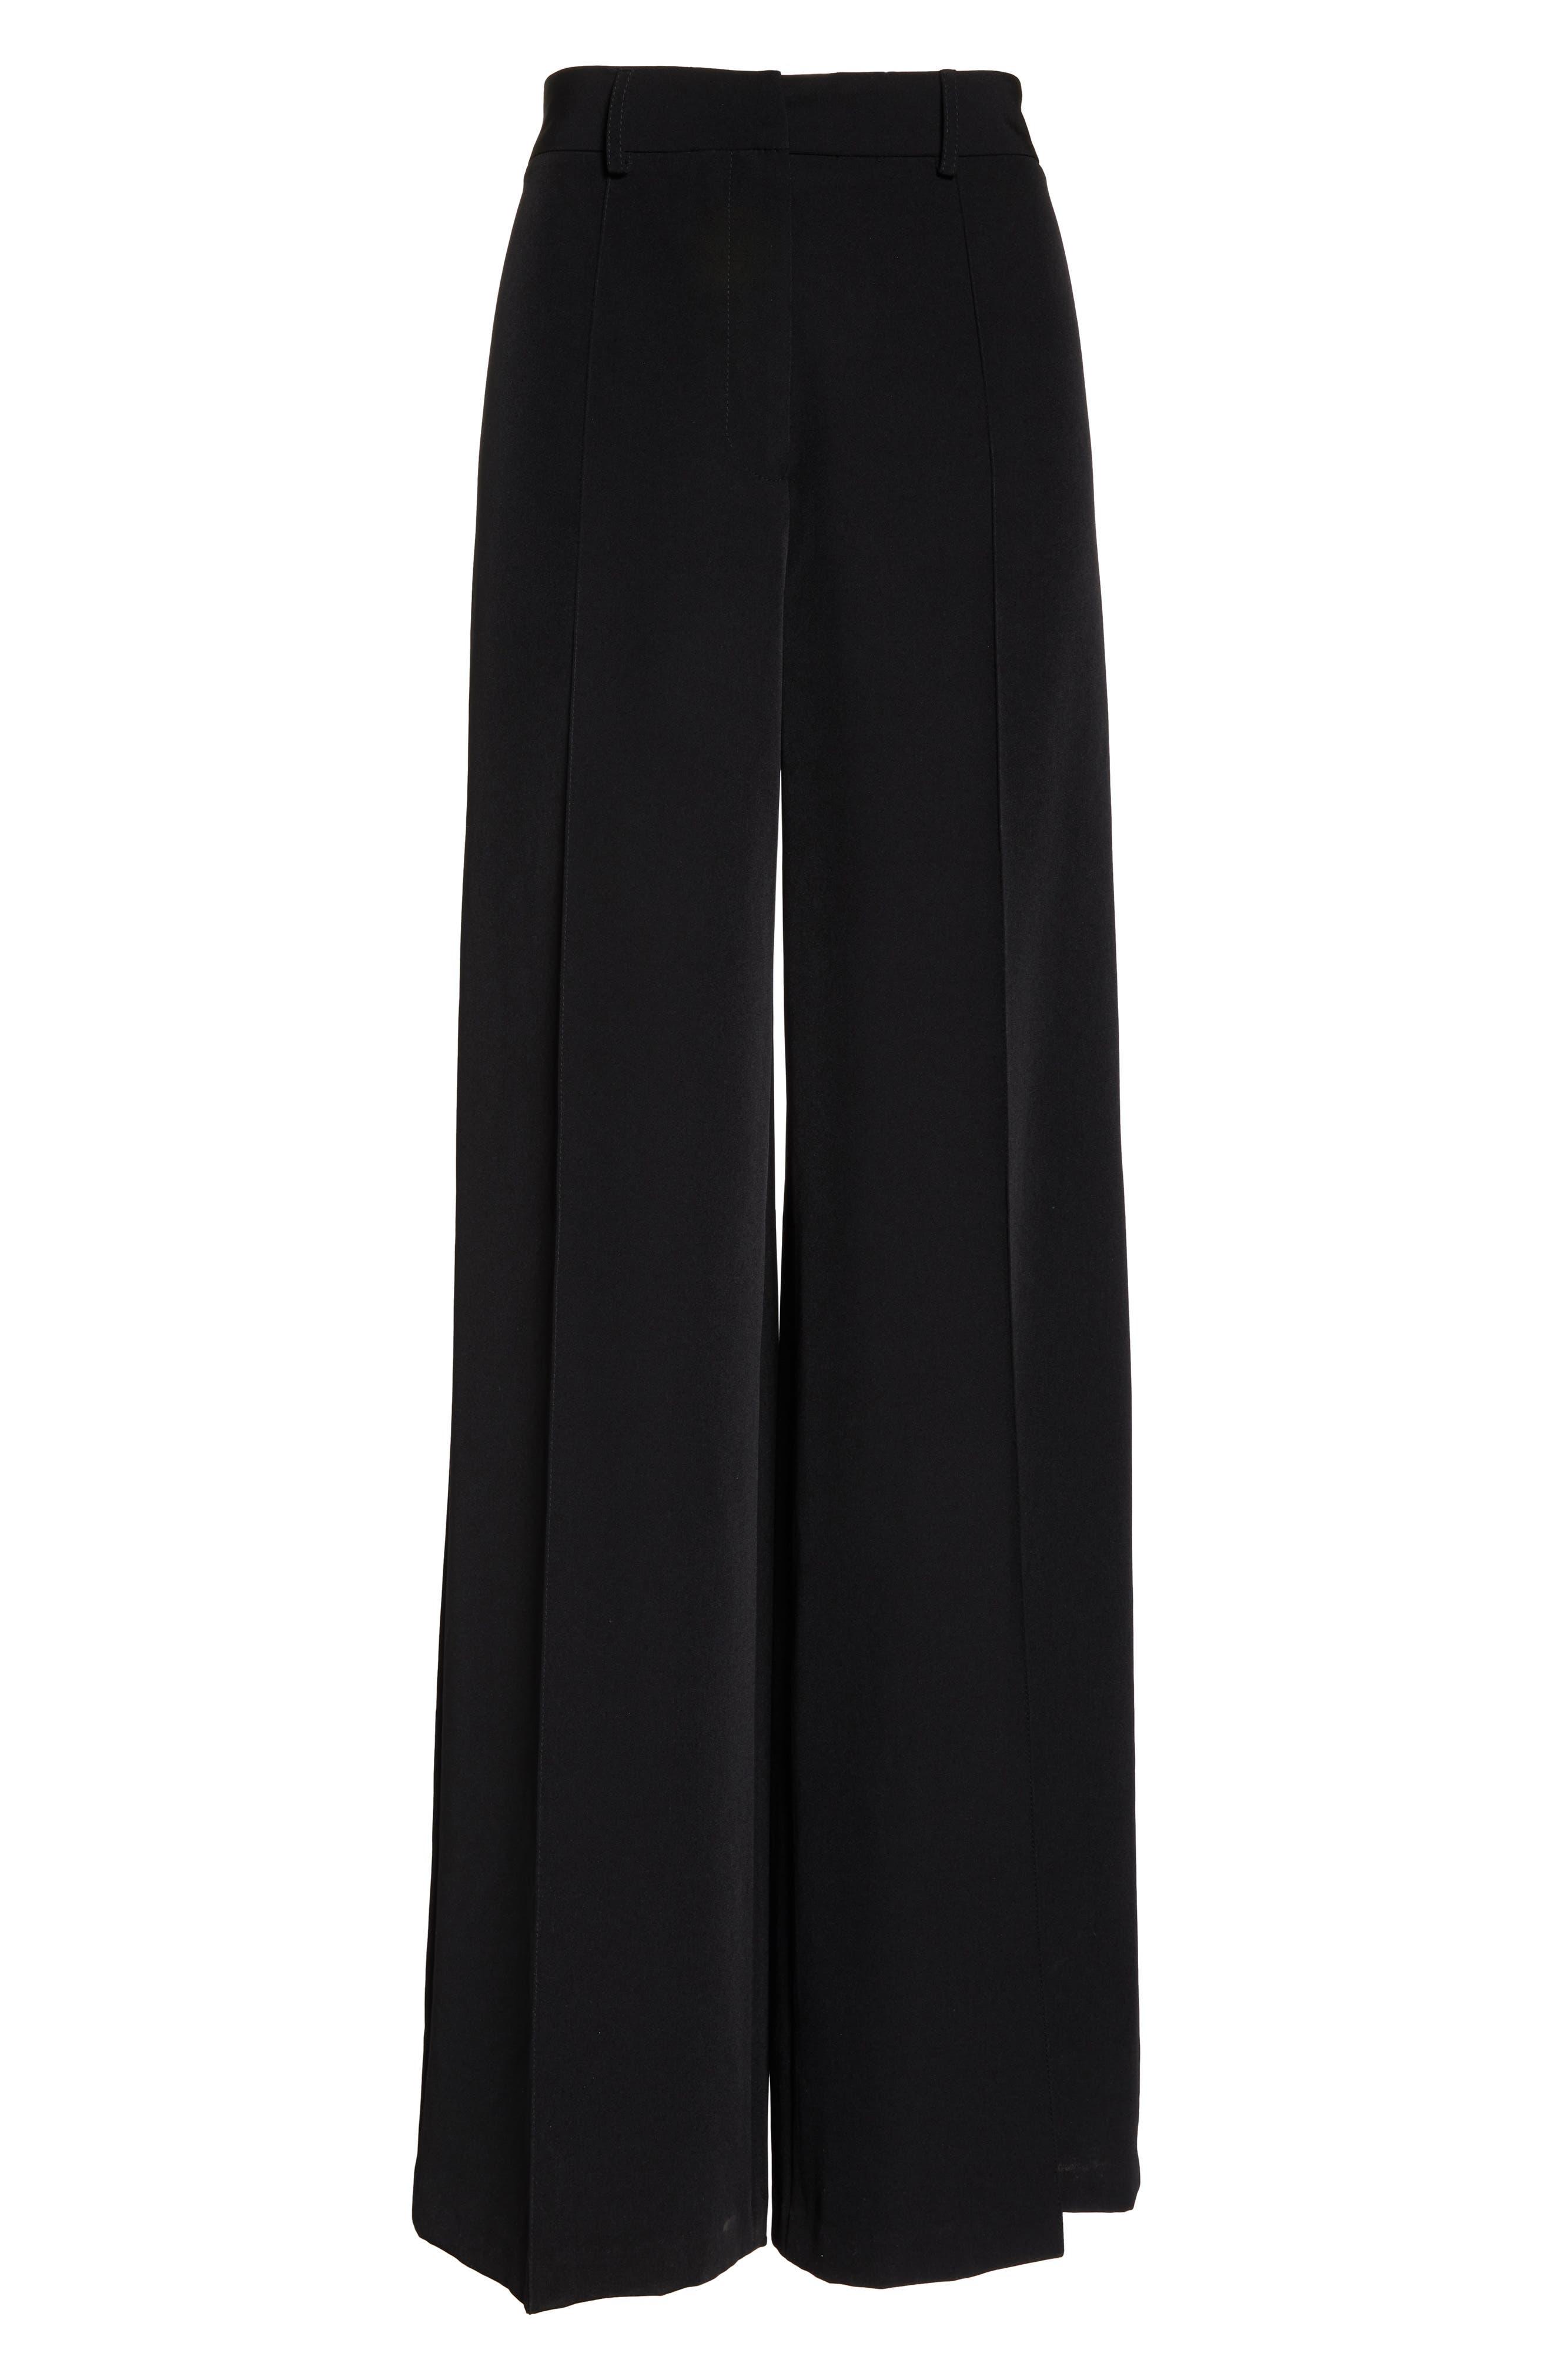 'Hayden' Wide Leg Trousers,                             Alternate thumbnail 7, color,                             BLACK